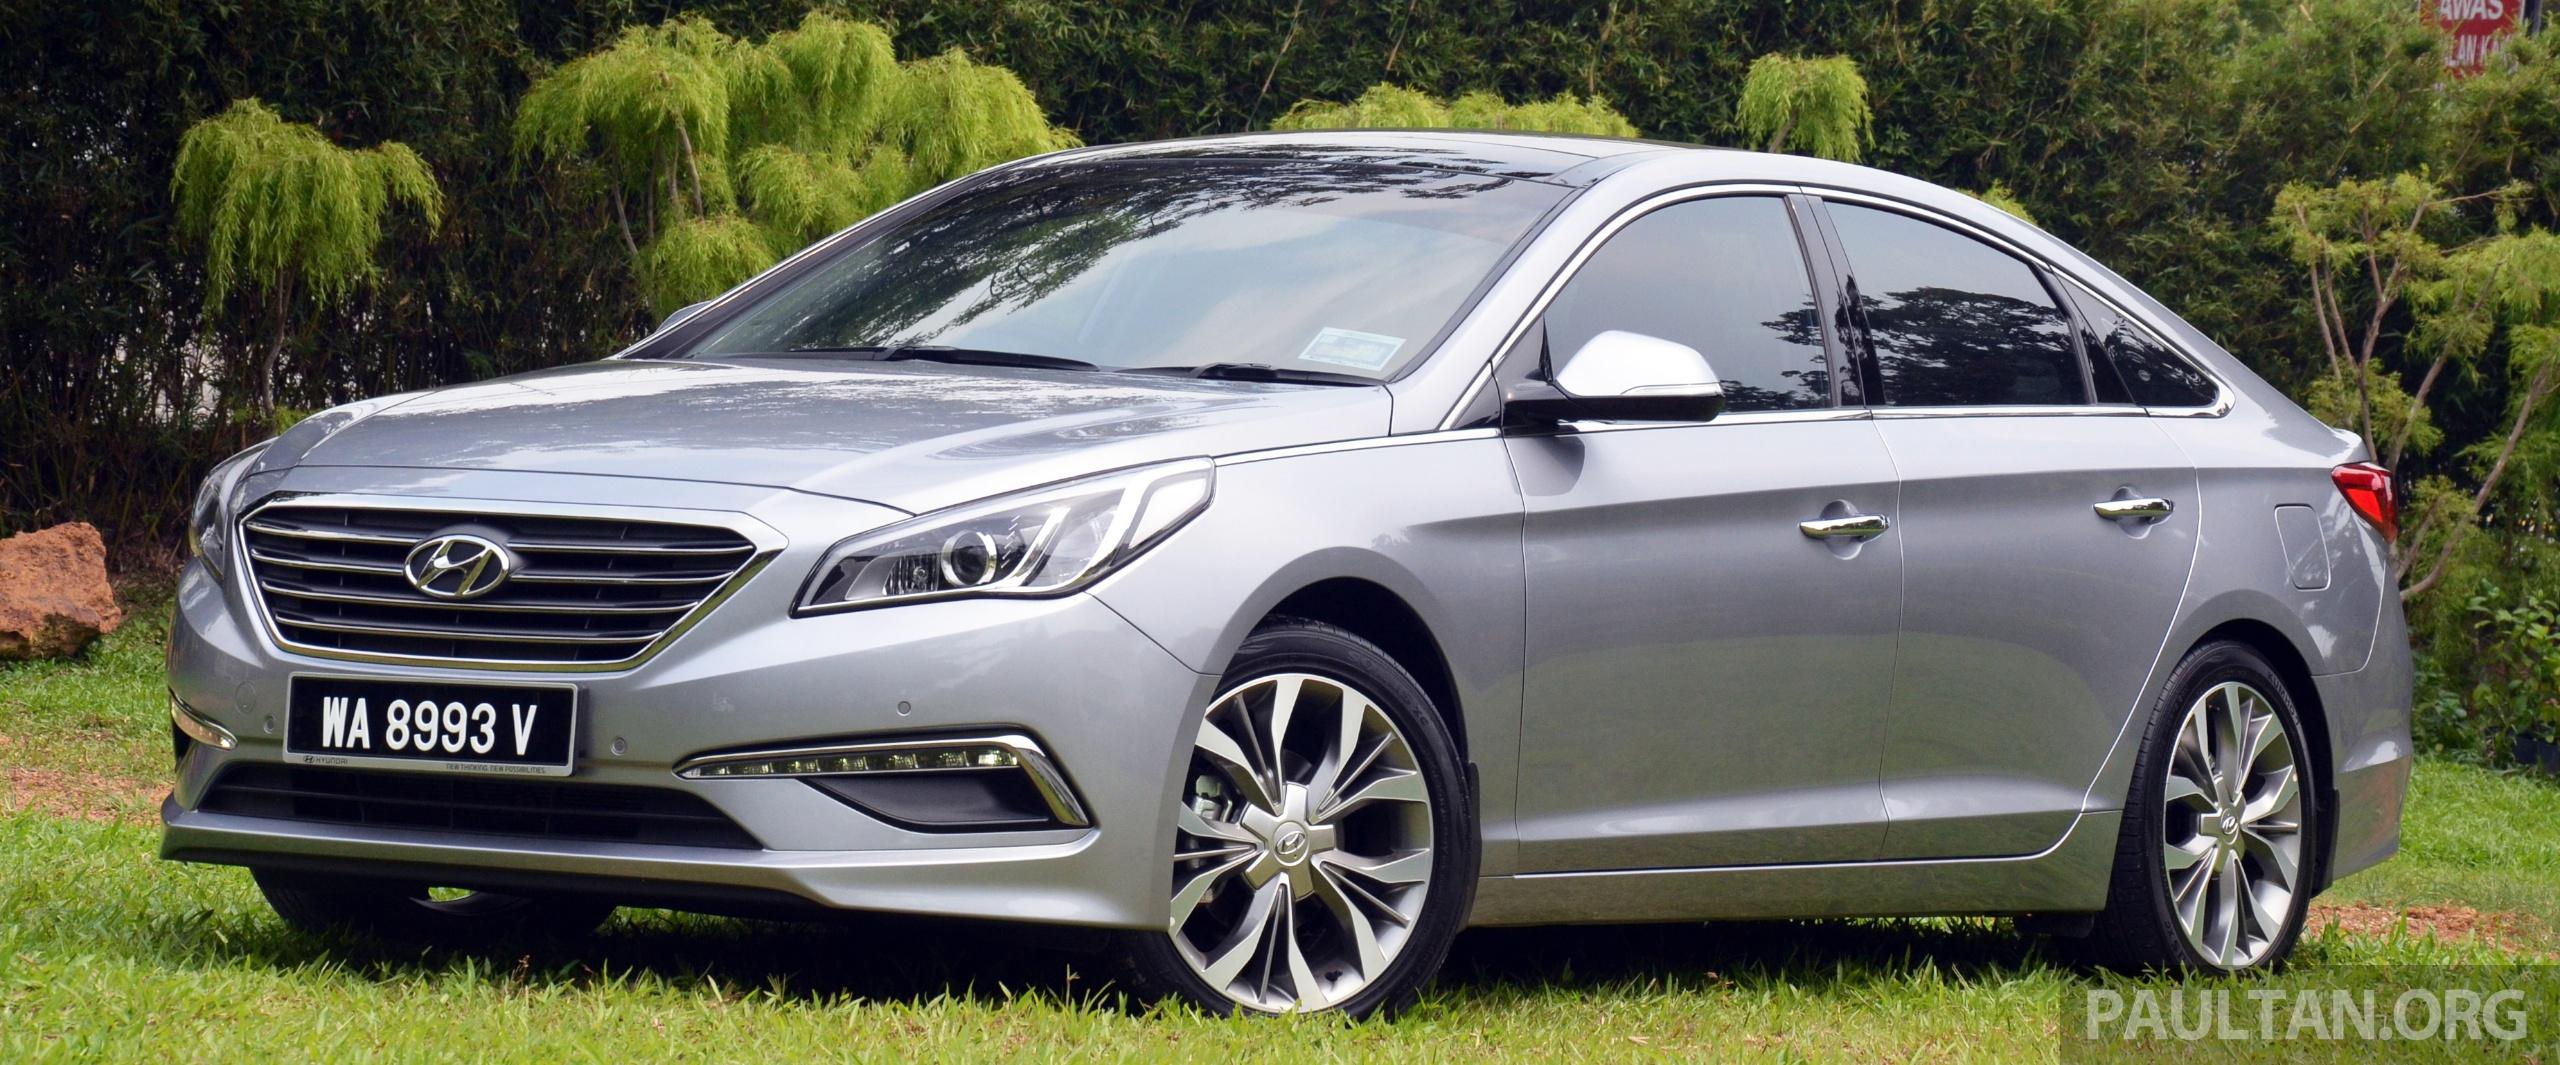 Driven Hyundai Sonata Lf 2 0 Executive Tested Paul Tan